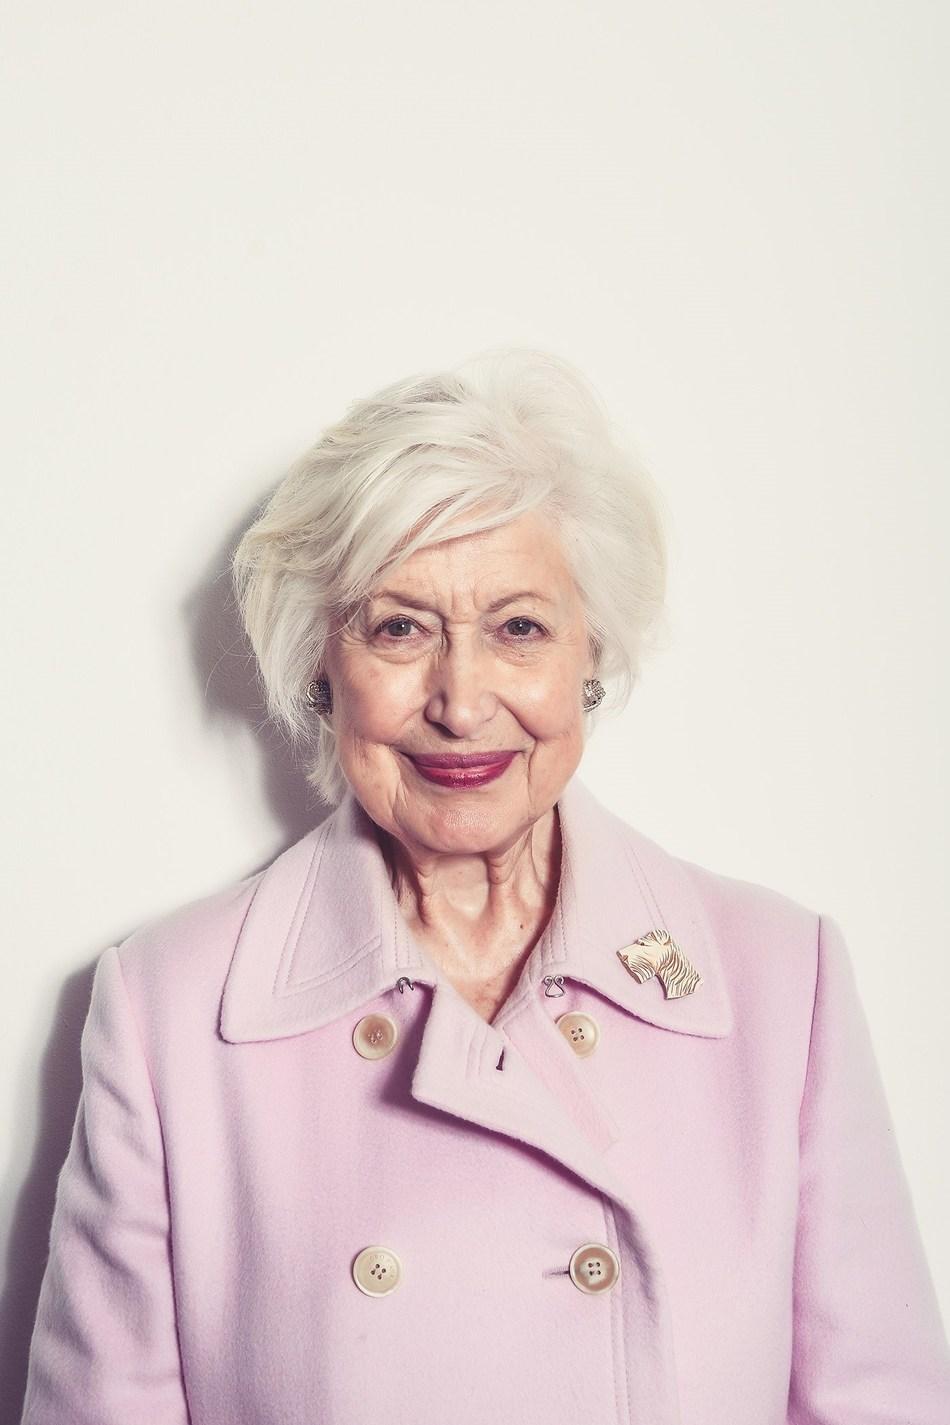 Caroline Neville MBE, President of CEW UK